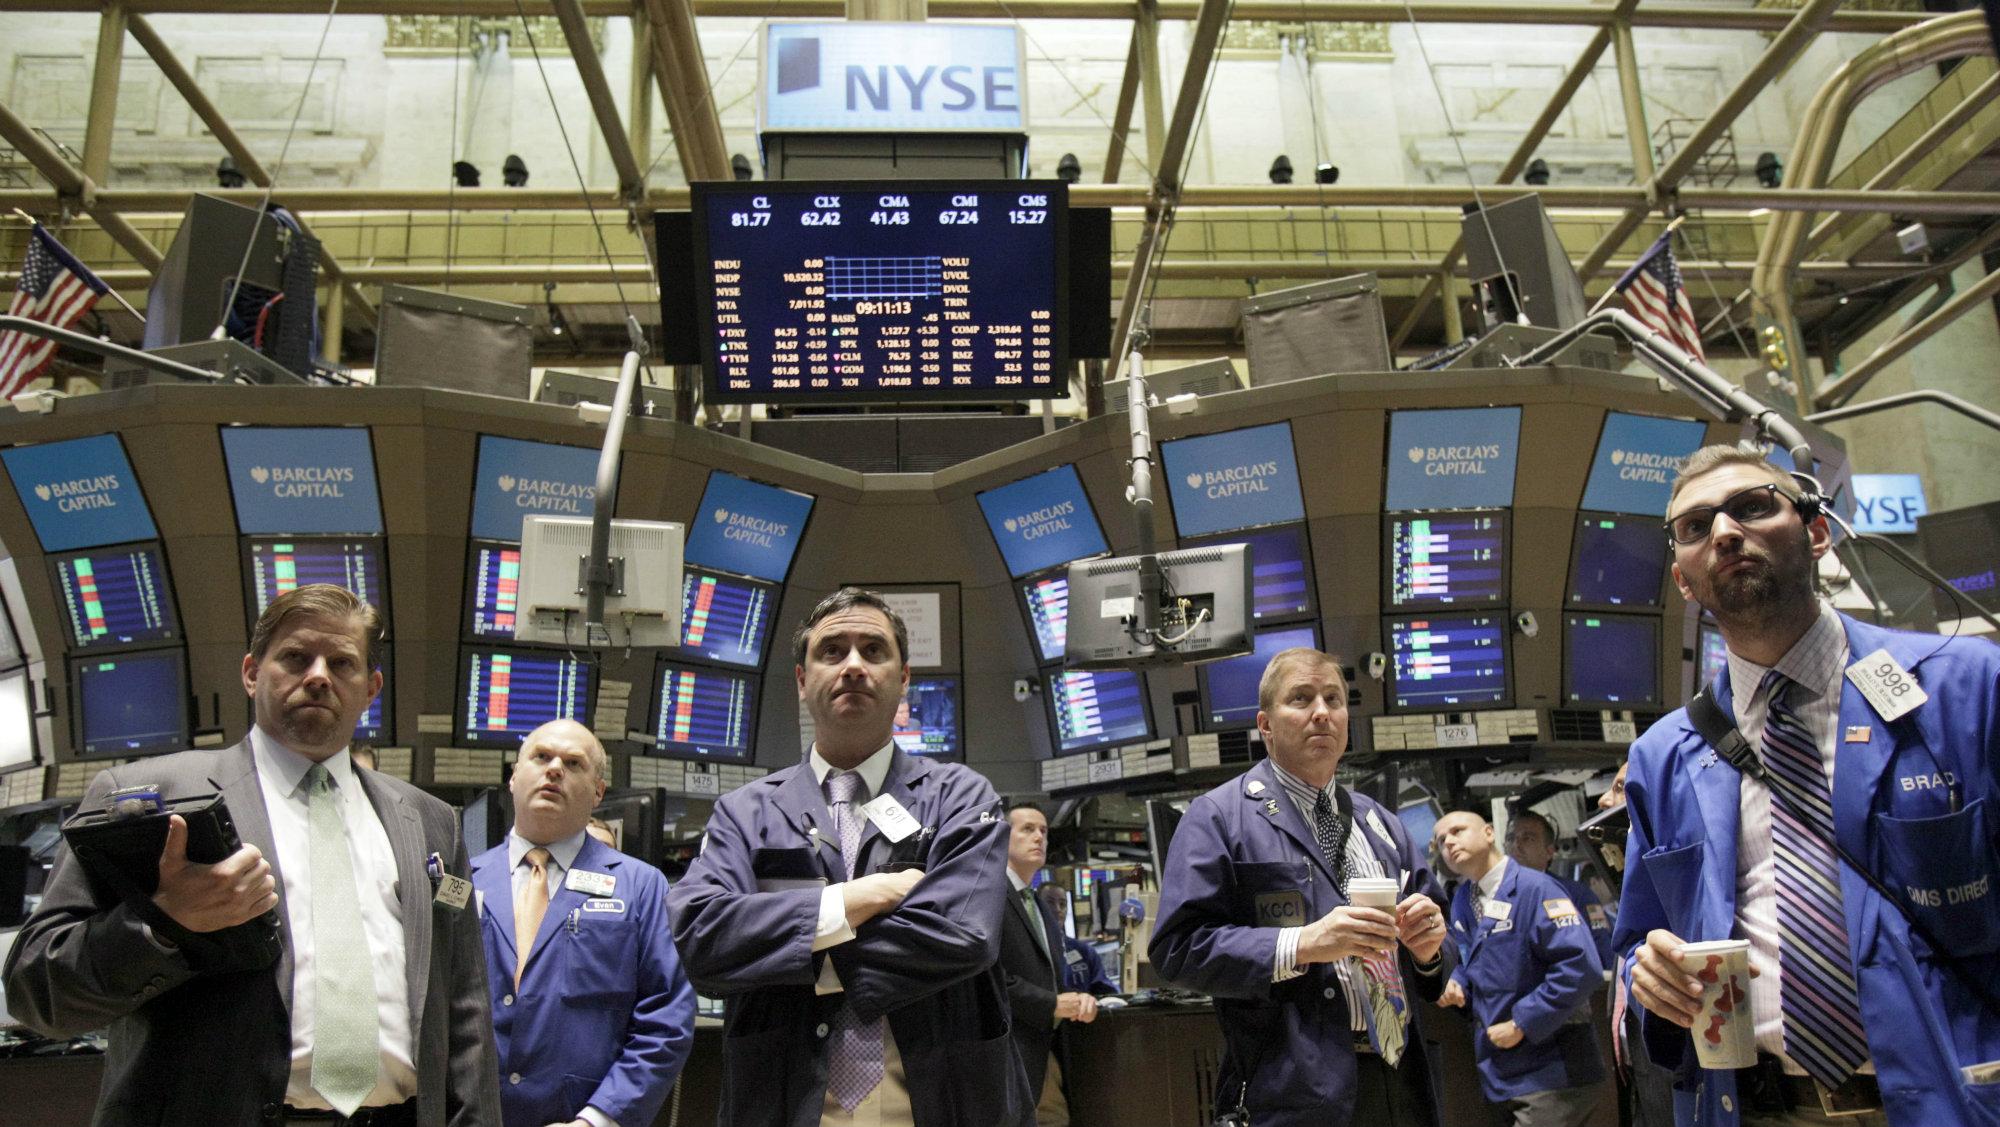 News traders